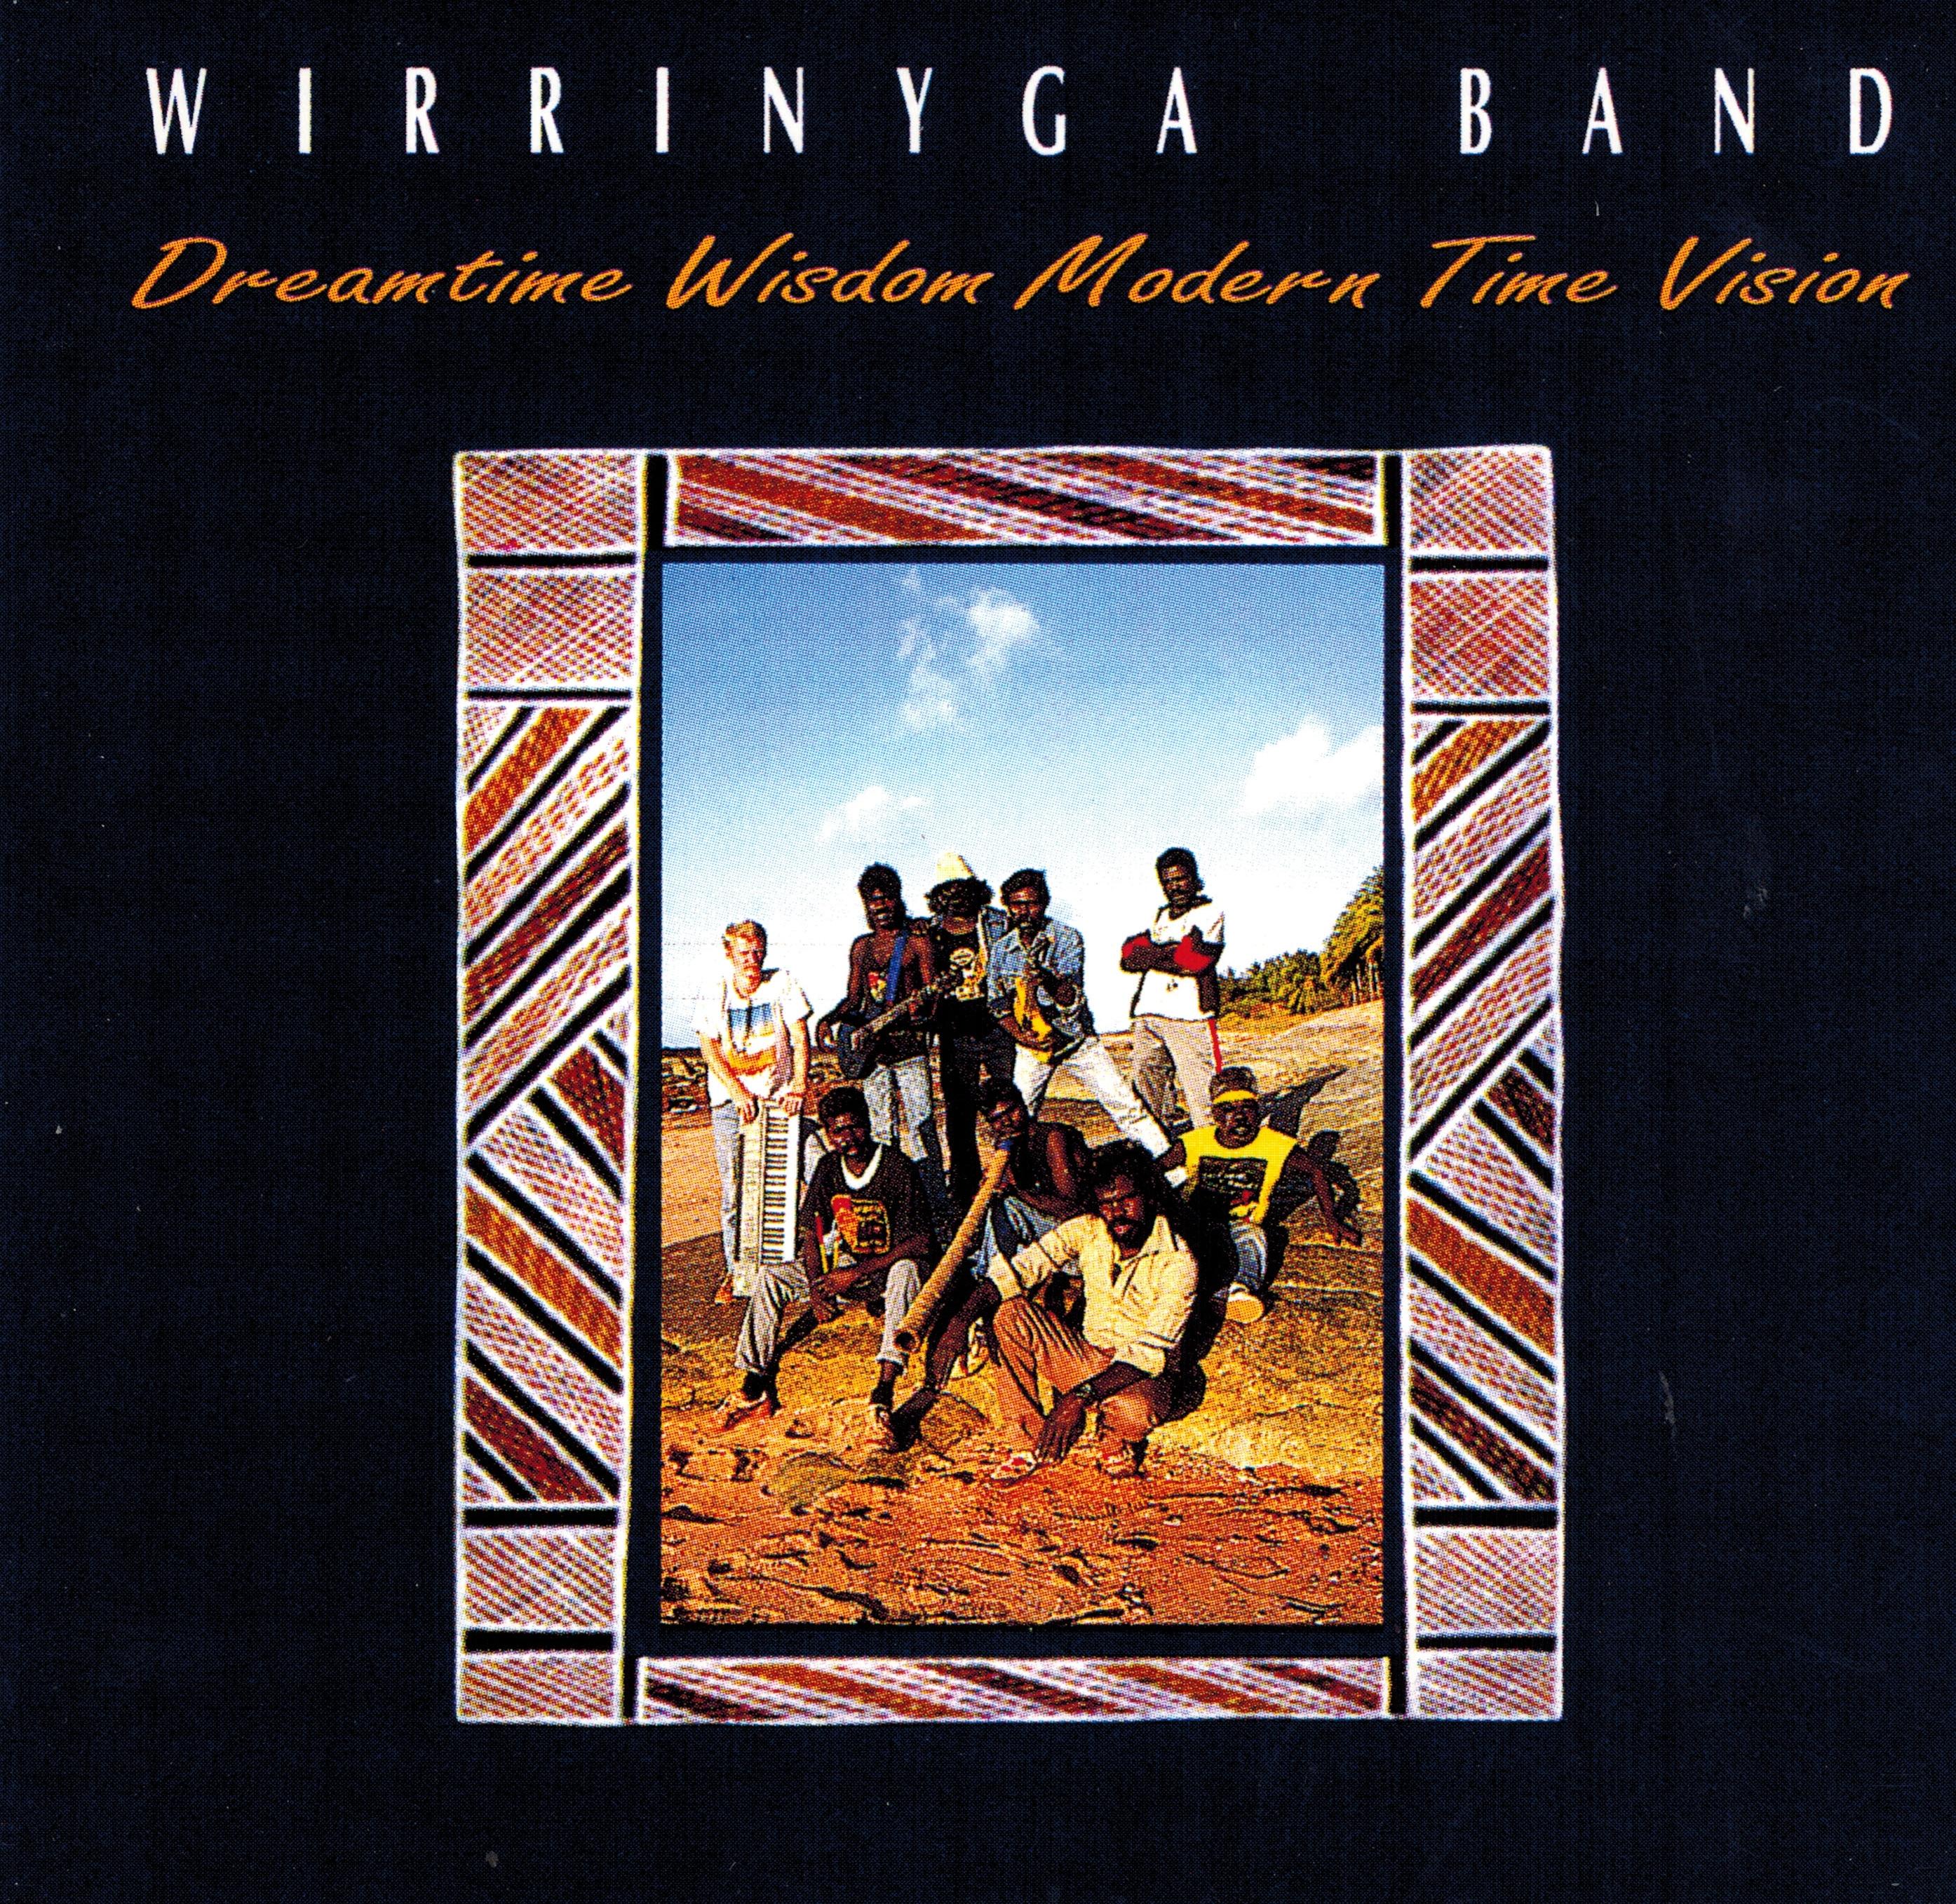 Dreamtime Wisdom Modern Time Vision - Wirrinyga Band